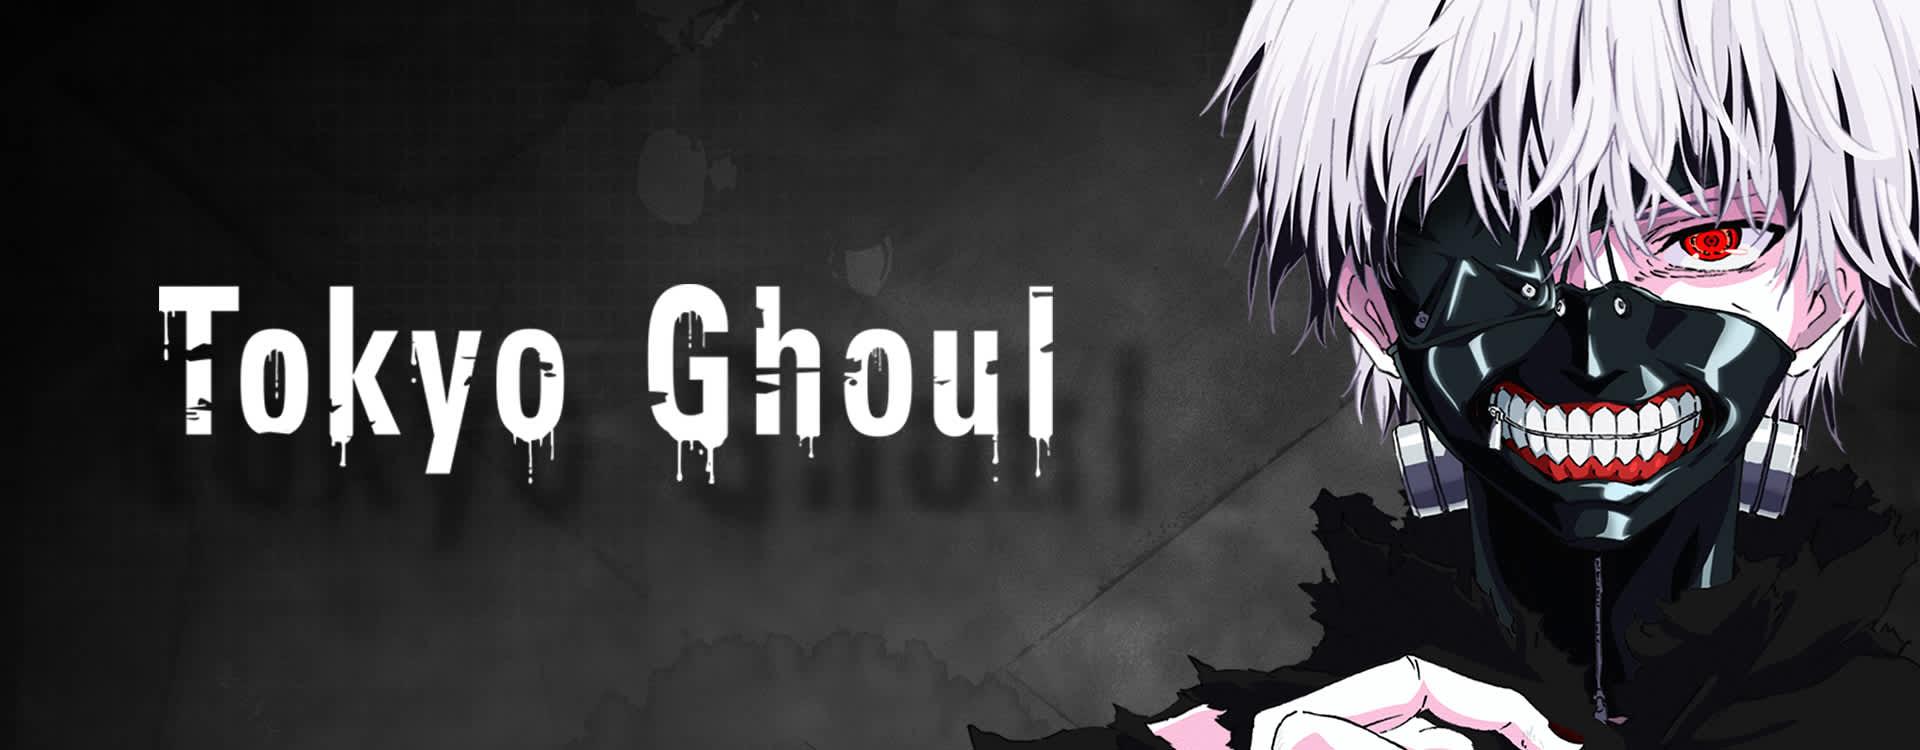 Tokyo ghoul episode list